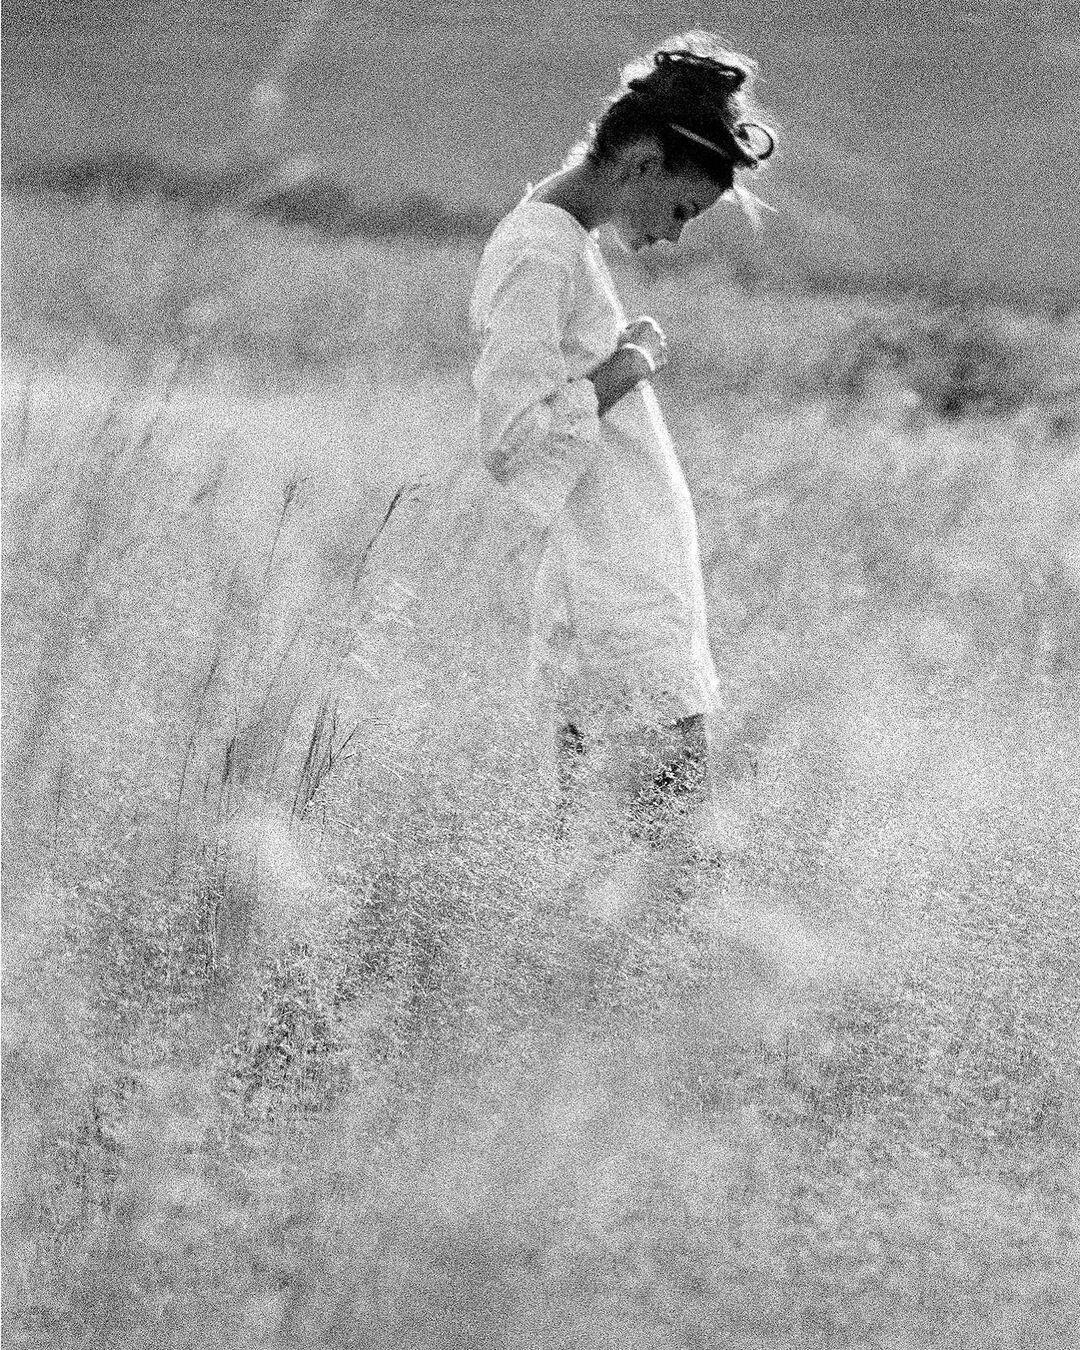 Прогулка по лугу, 1963. Фотограф Сэм Хаскинс